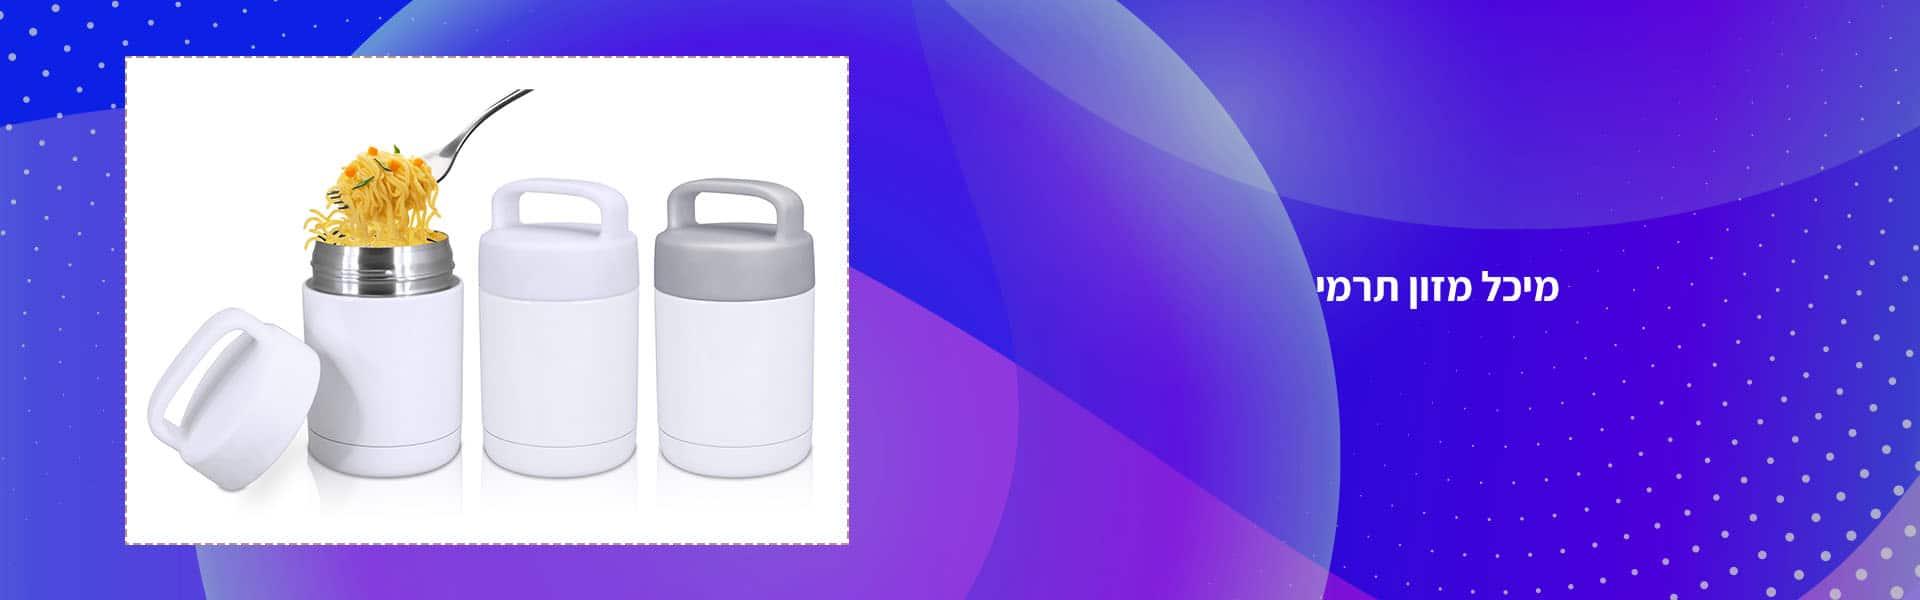 banner-desktop2